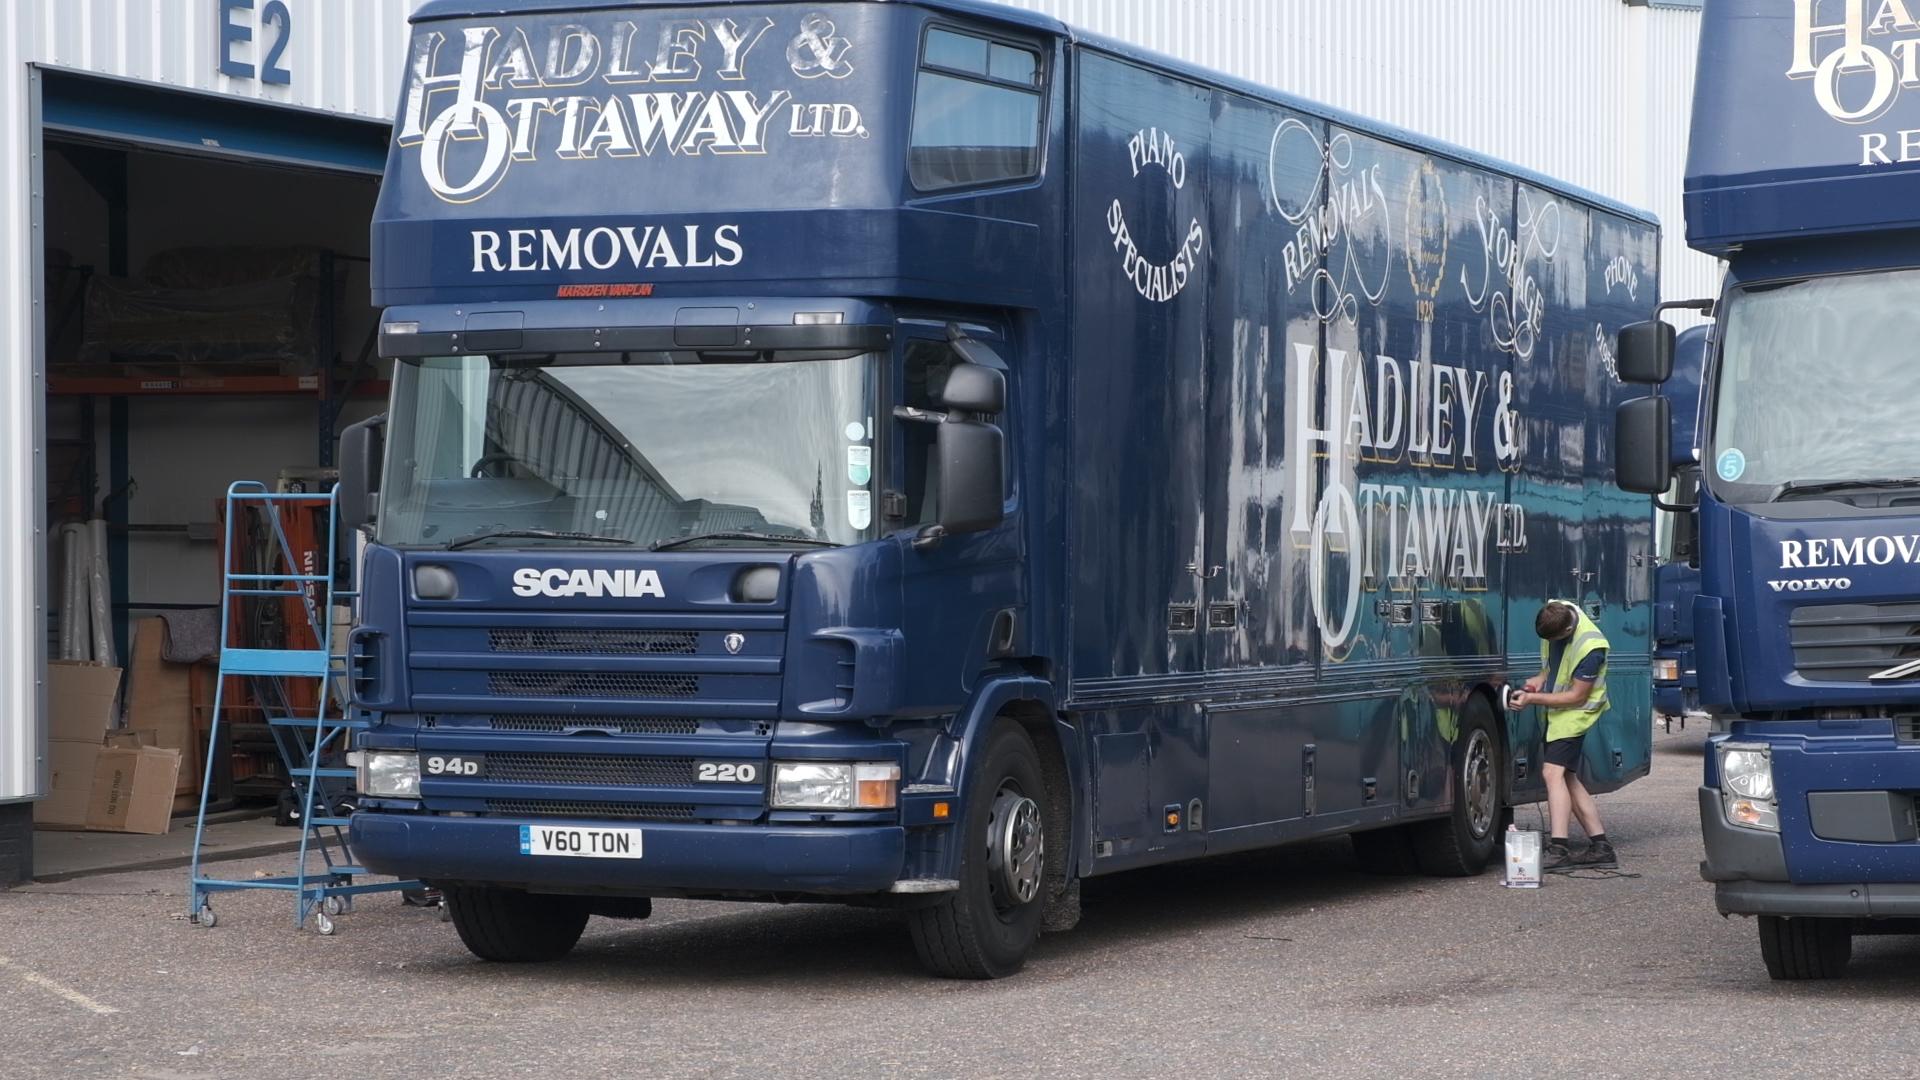 Hadley & Ottaway Ltd